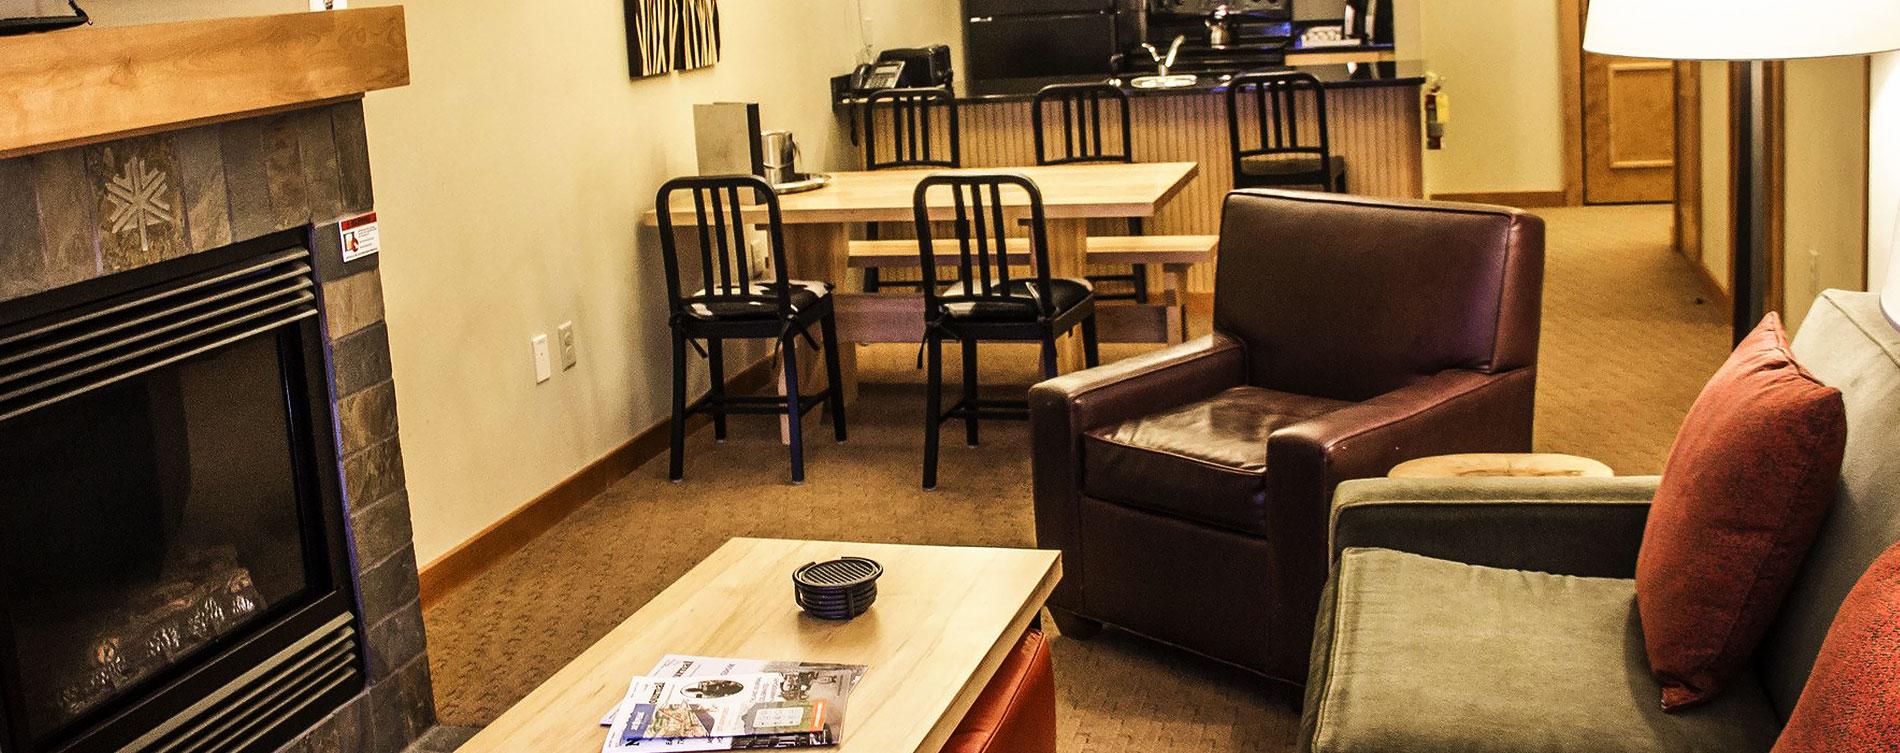 Culture & Vision of American Resort Management, Pennsylvania